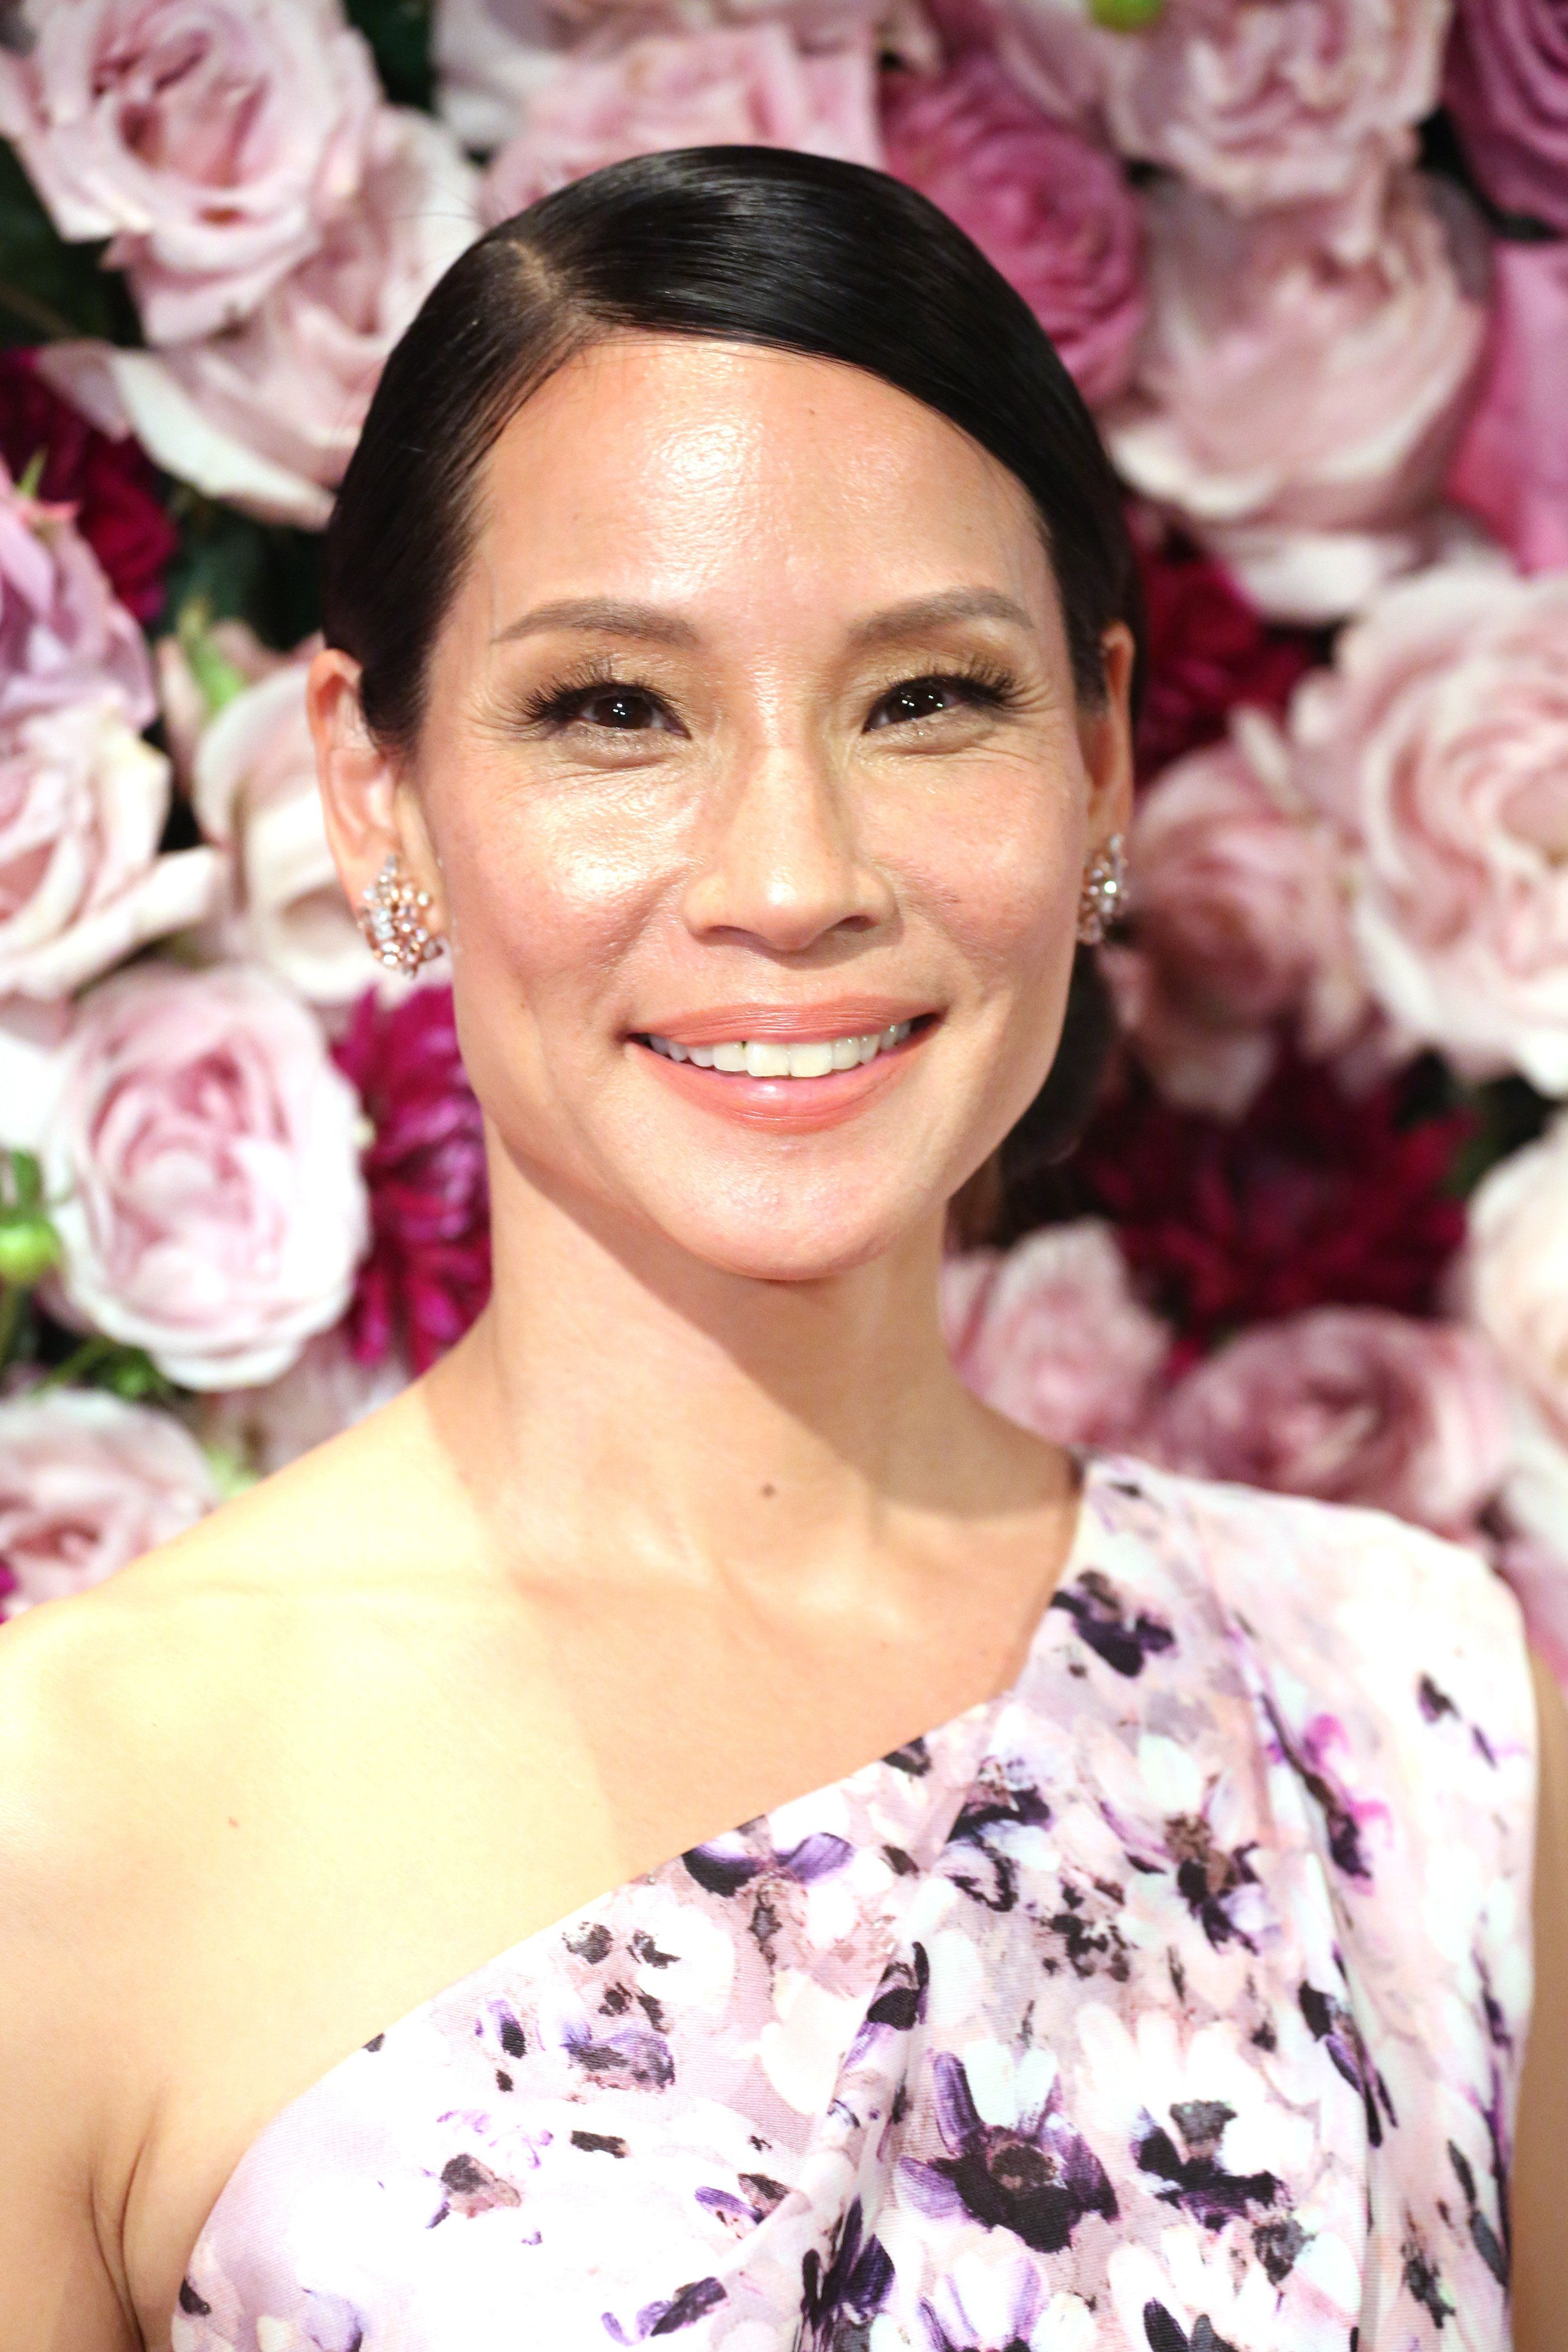 'Luke Cage' Has Nabbed Lucy Liu To Direct Its Season 2